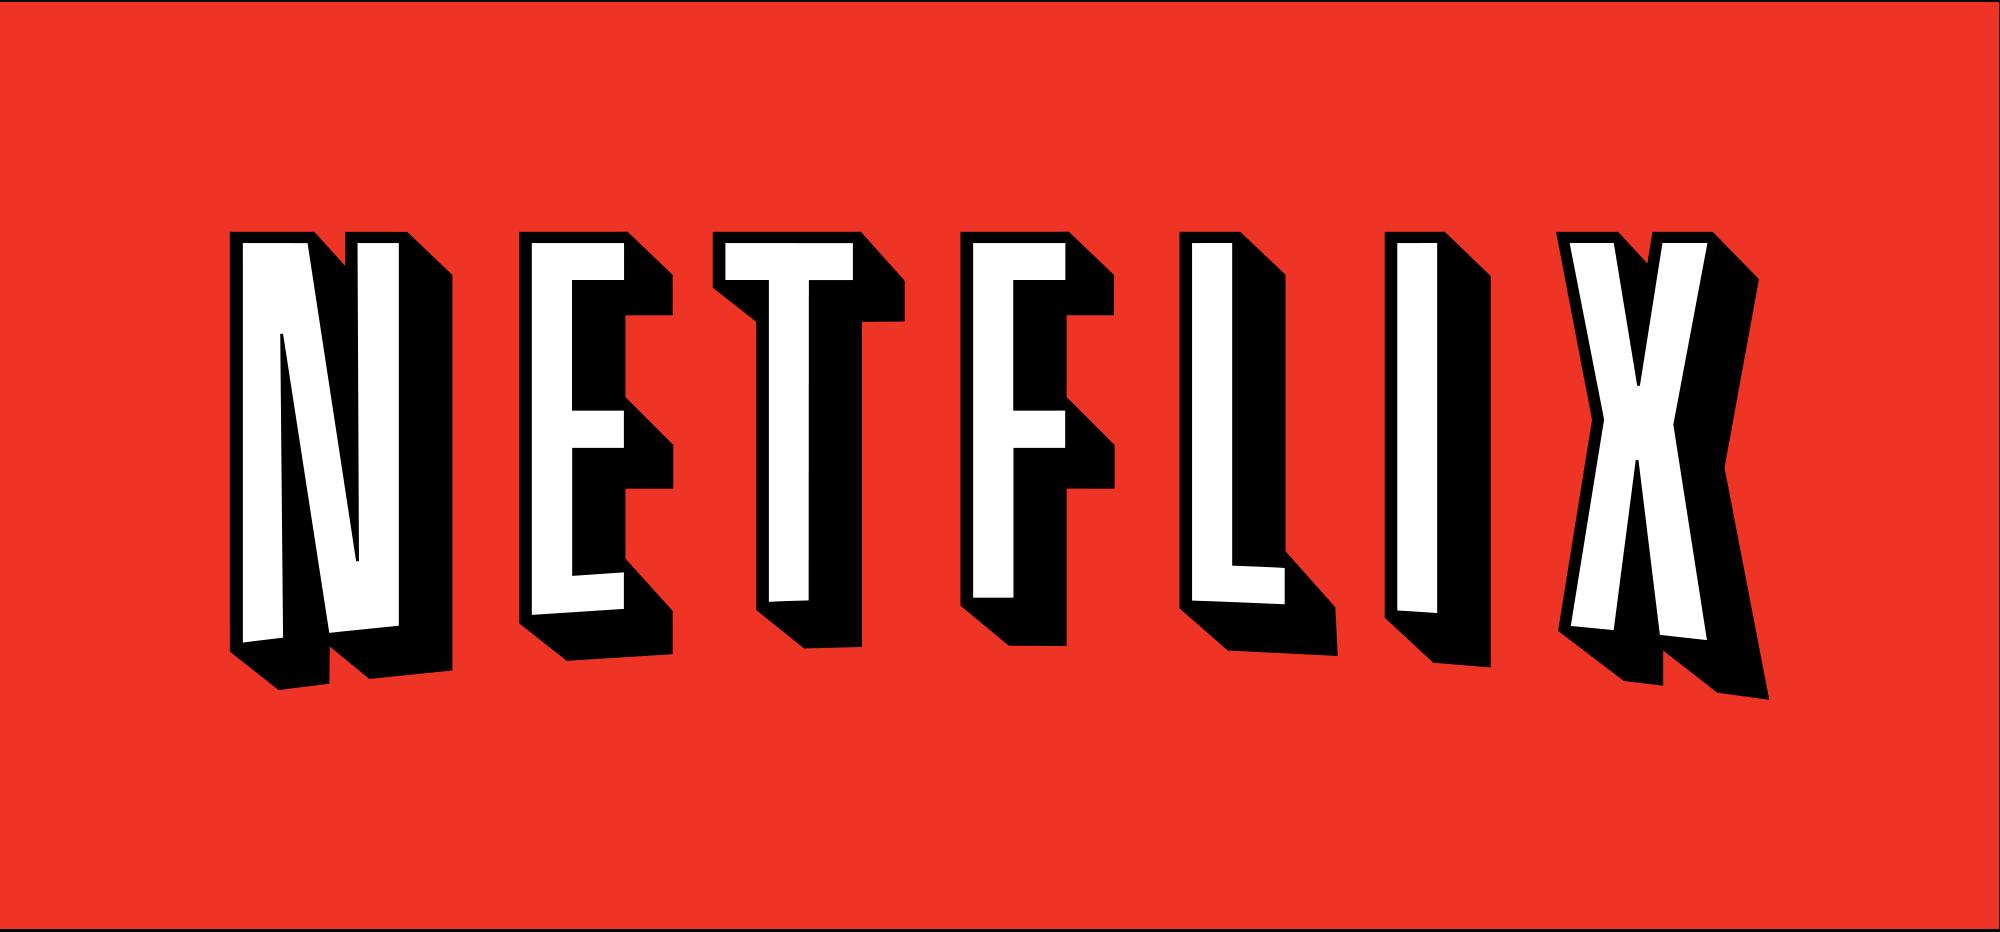 Ratatouille (2007) is available on Netflix